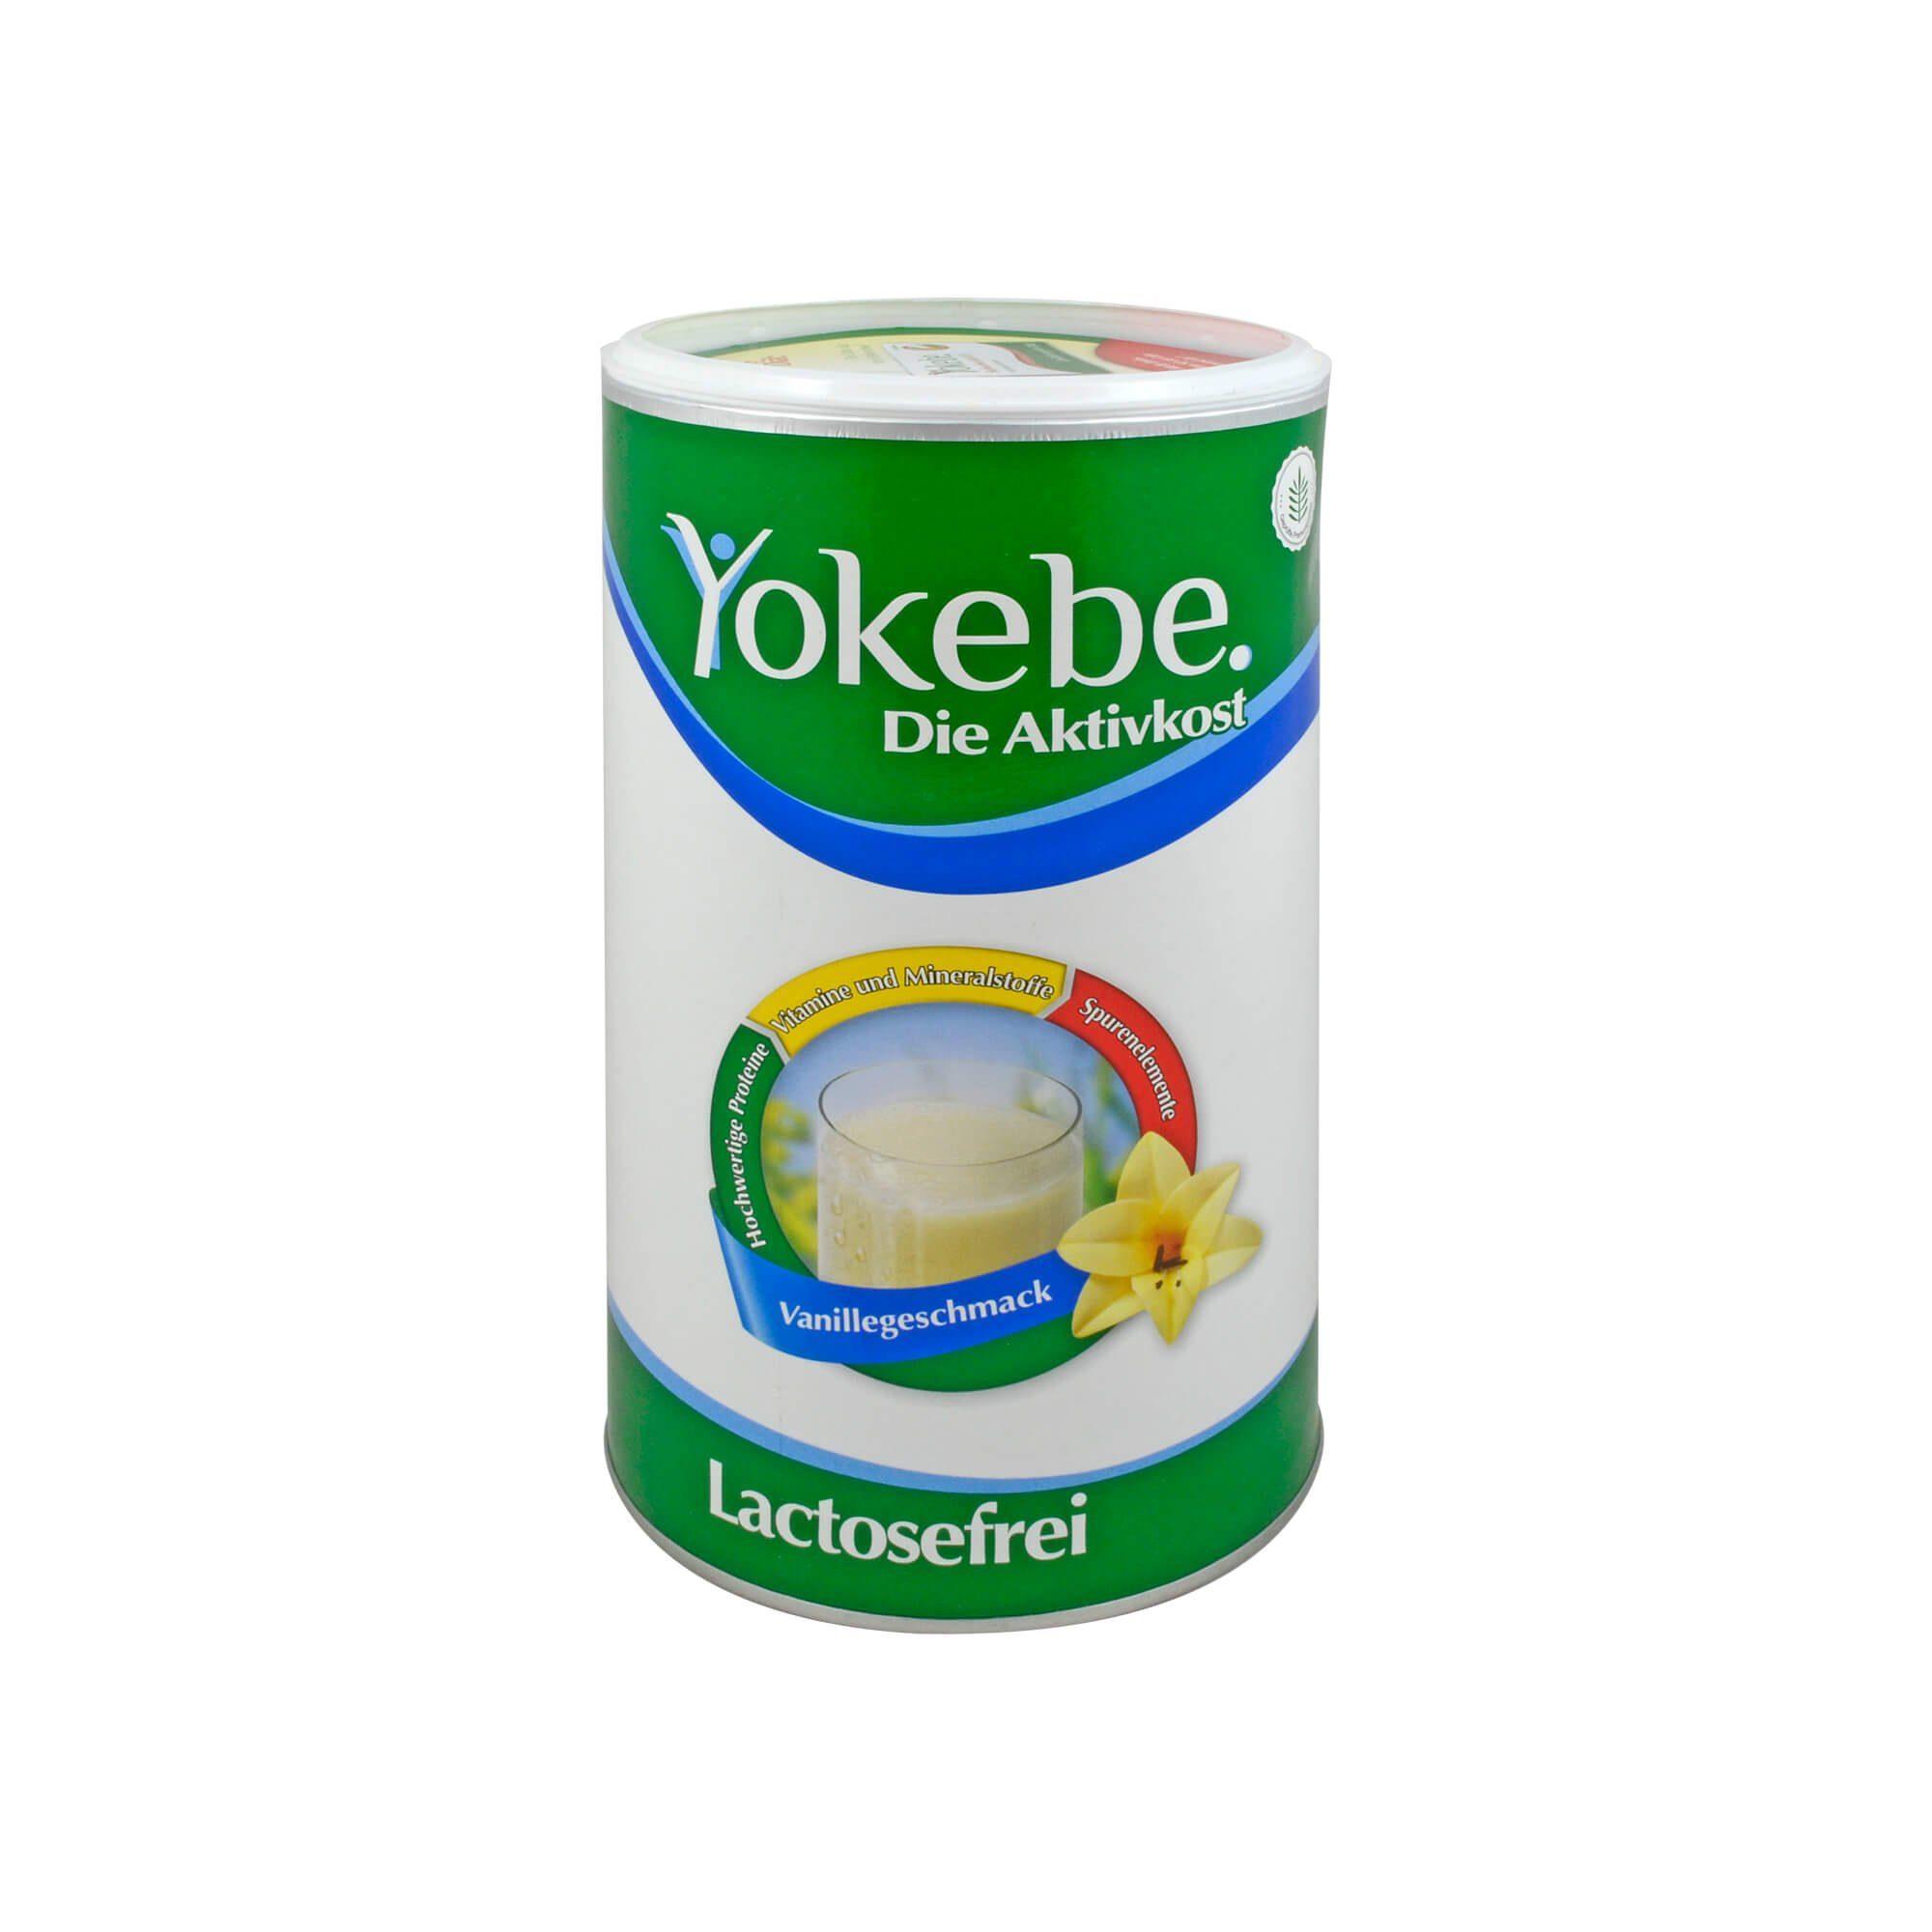 Yokebe Lactosefrei Vanille , 500 g